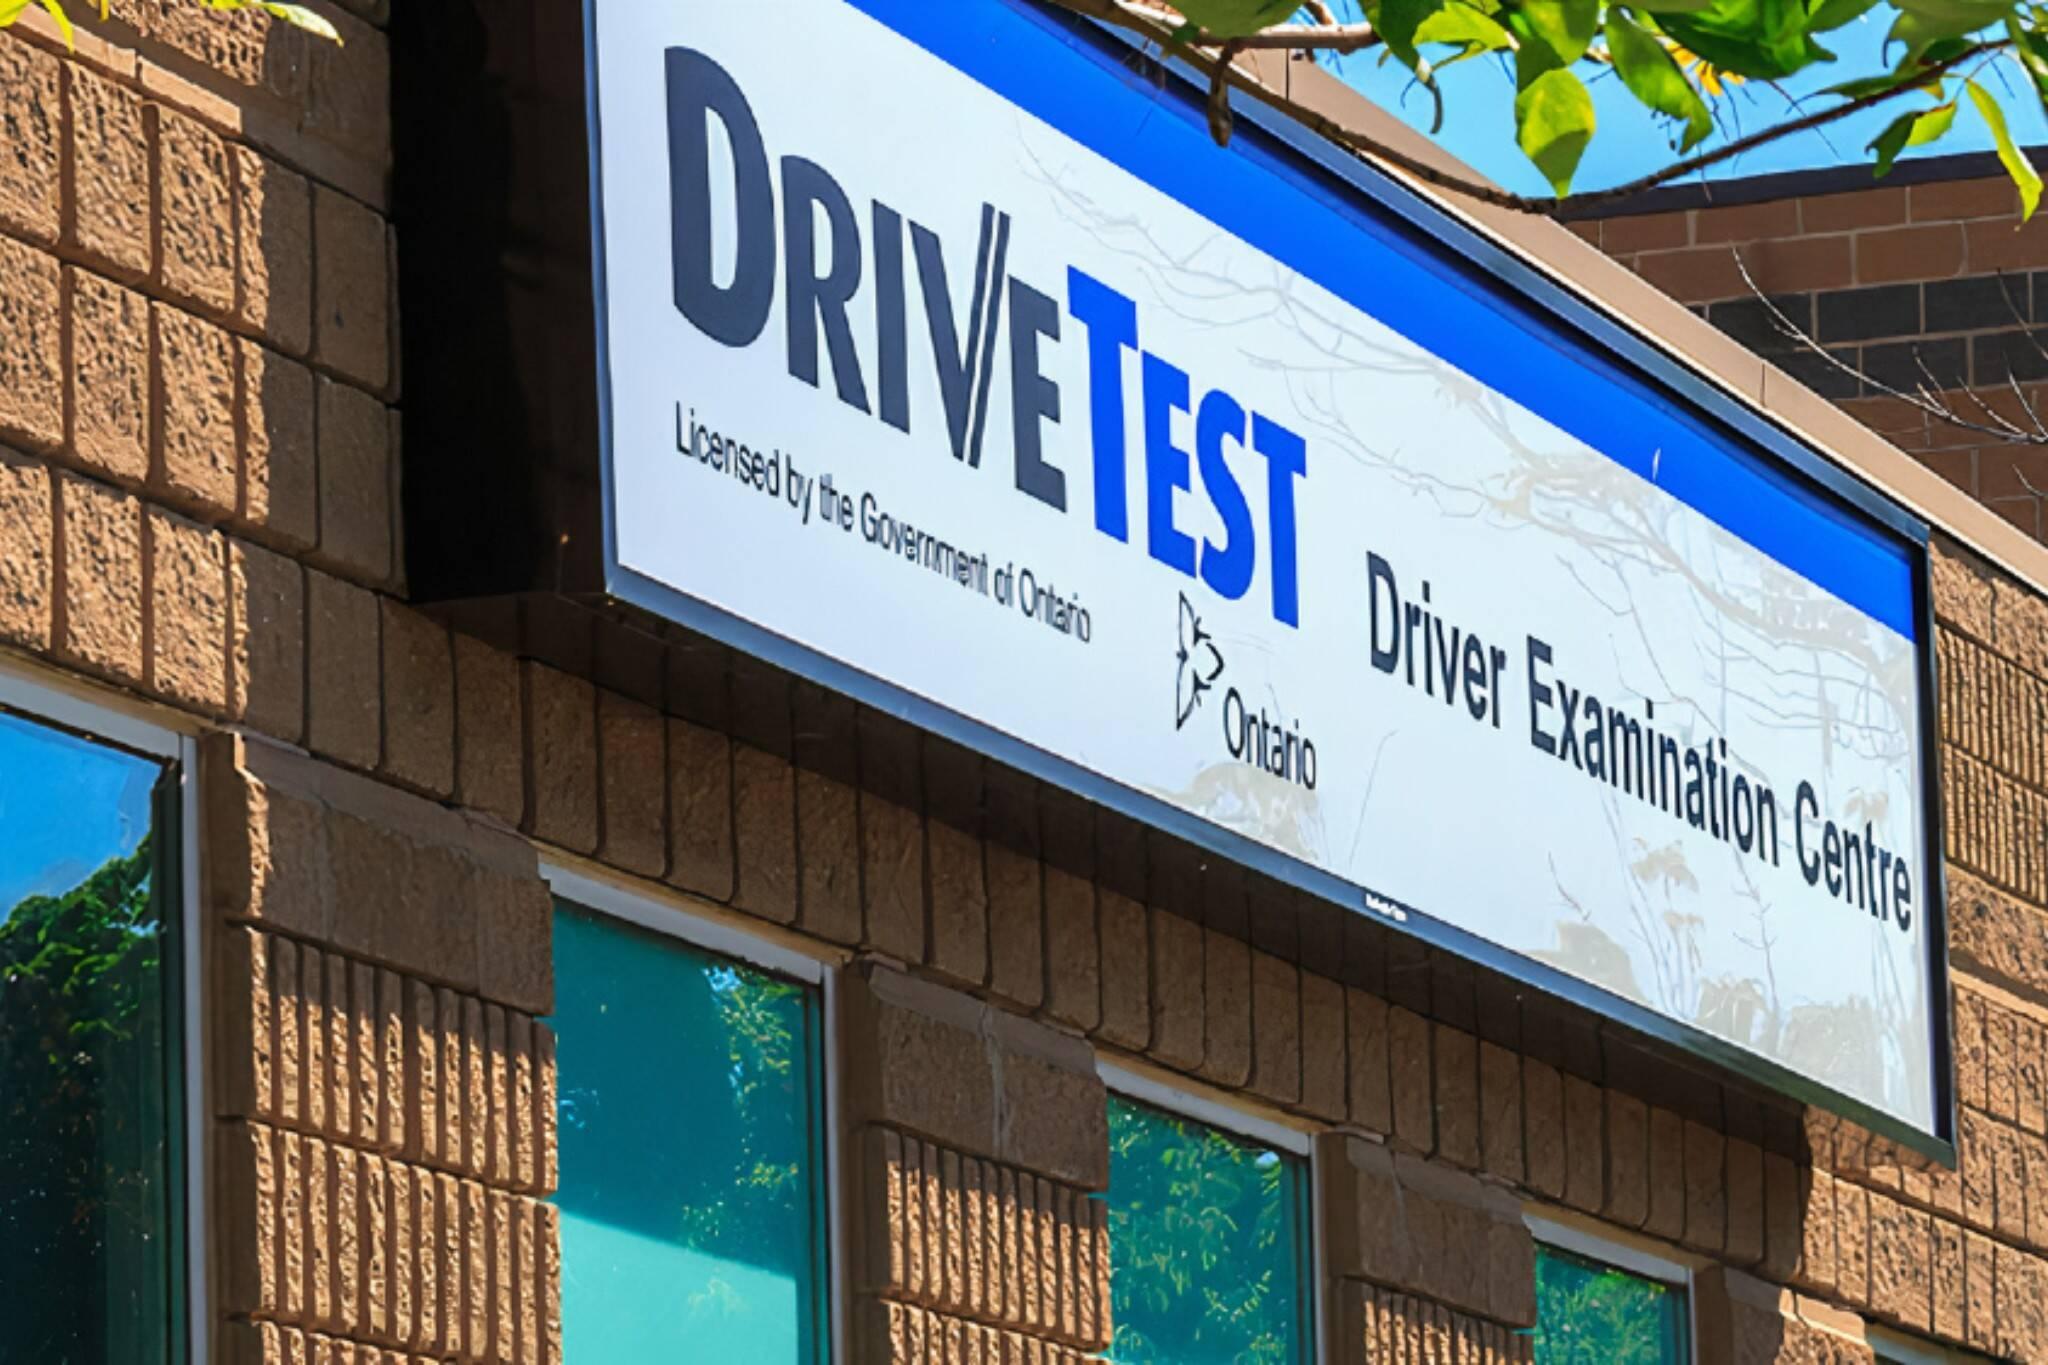 drivetest ontario